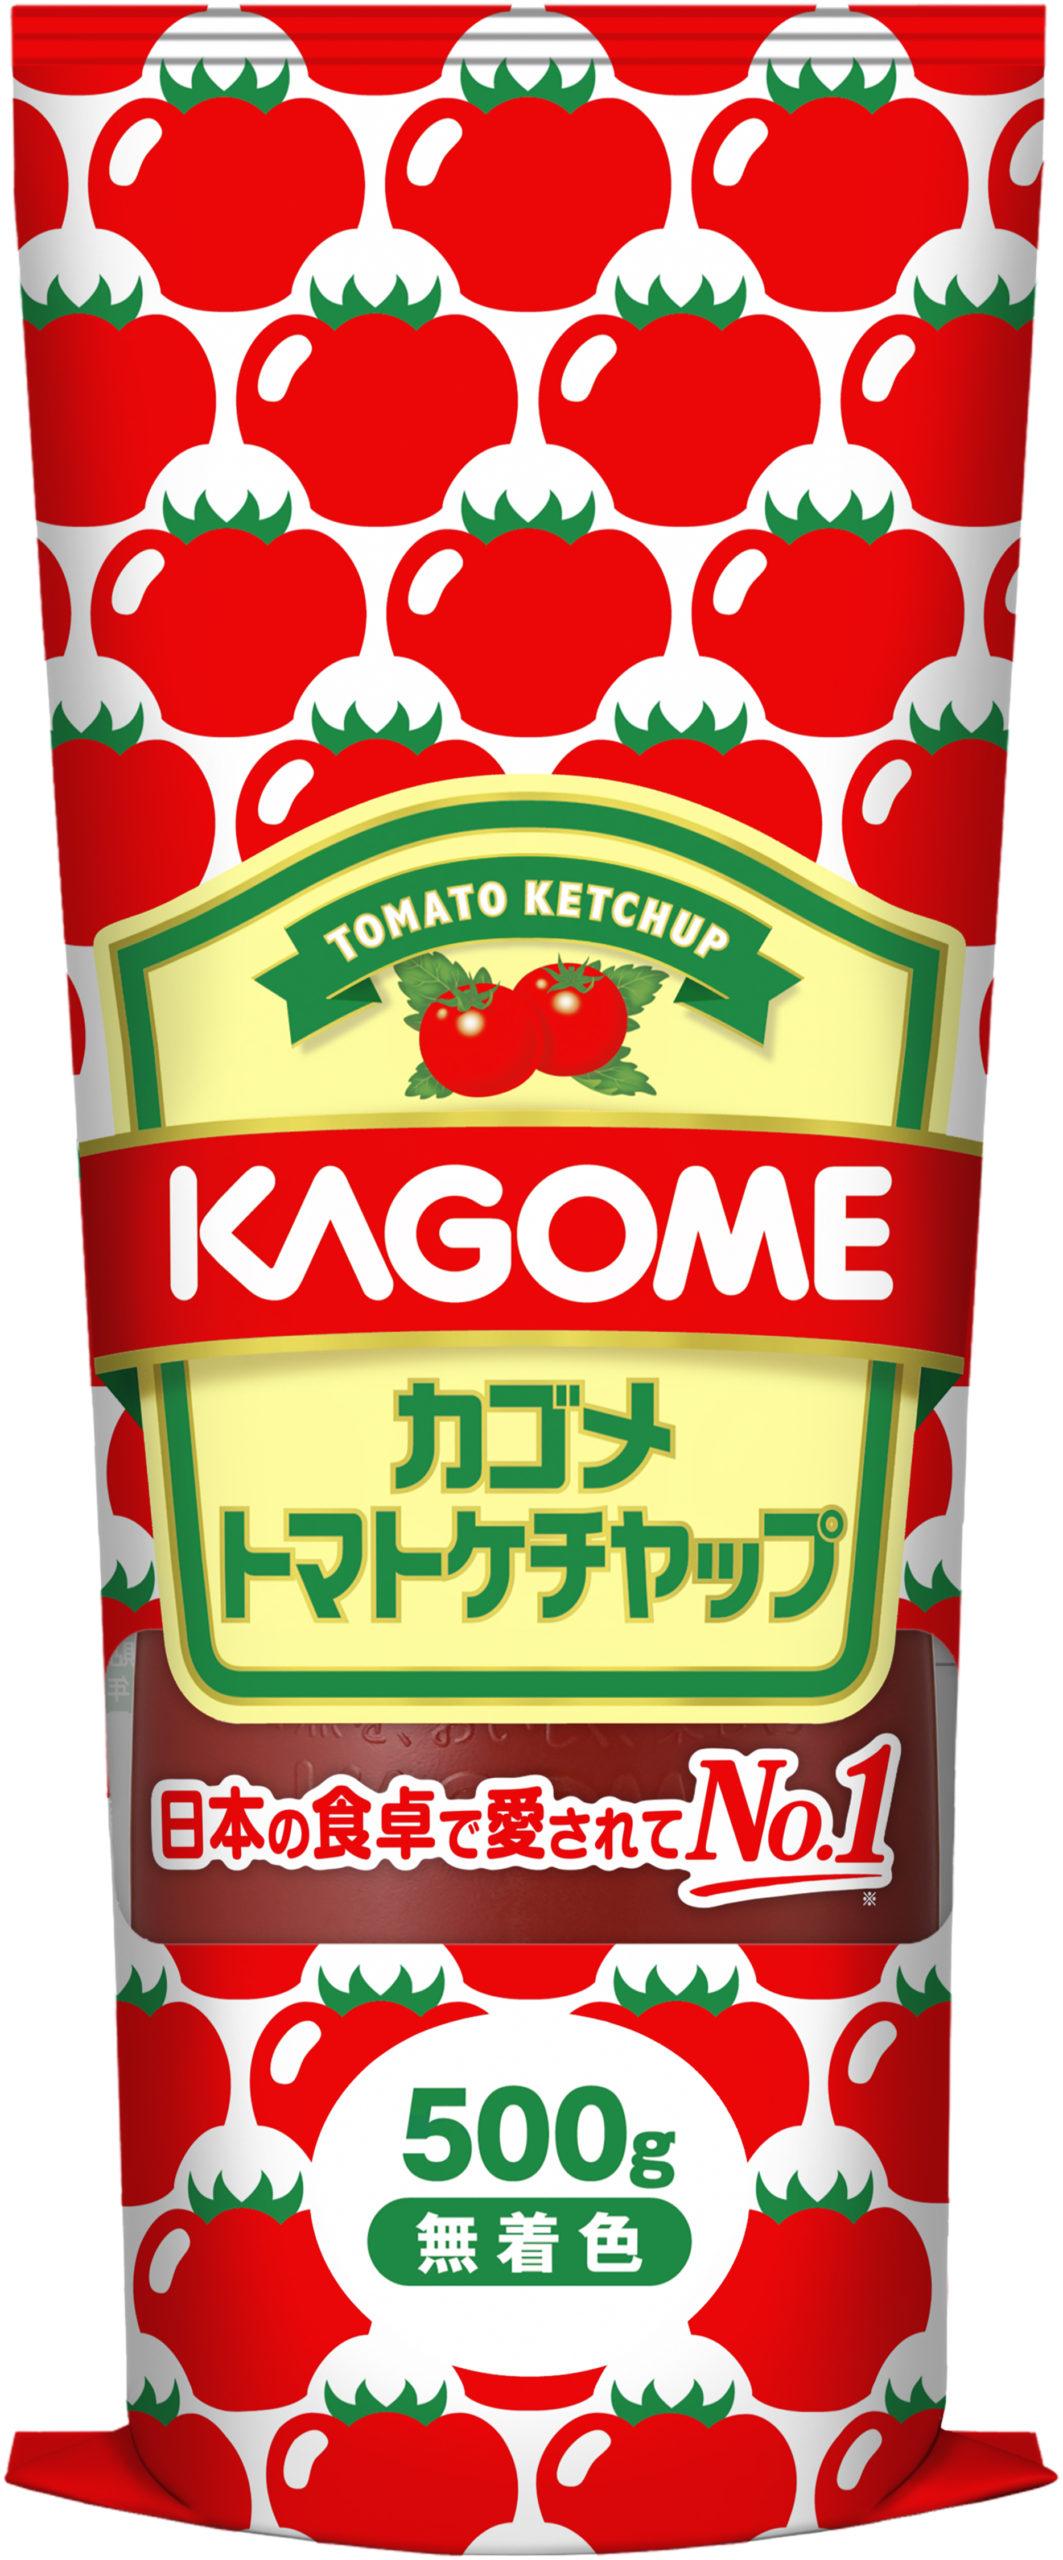 KAGOME トマトケチャップ